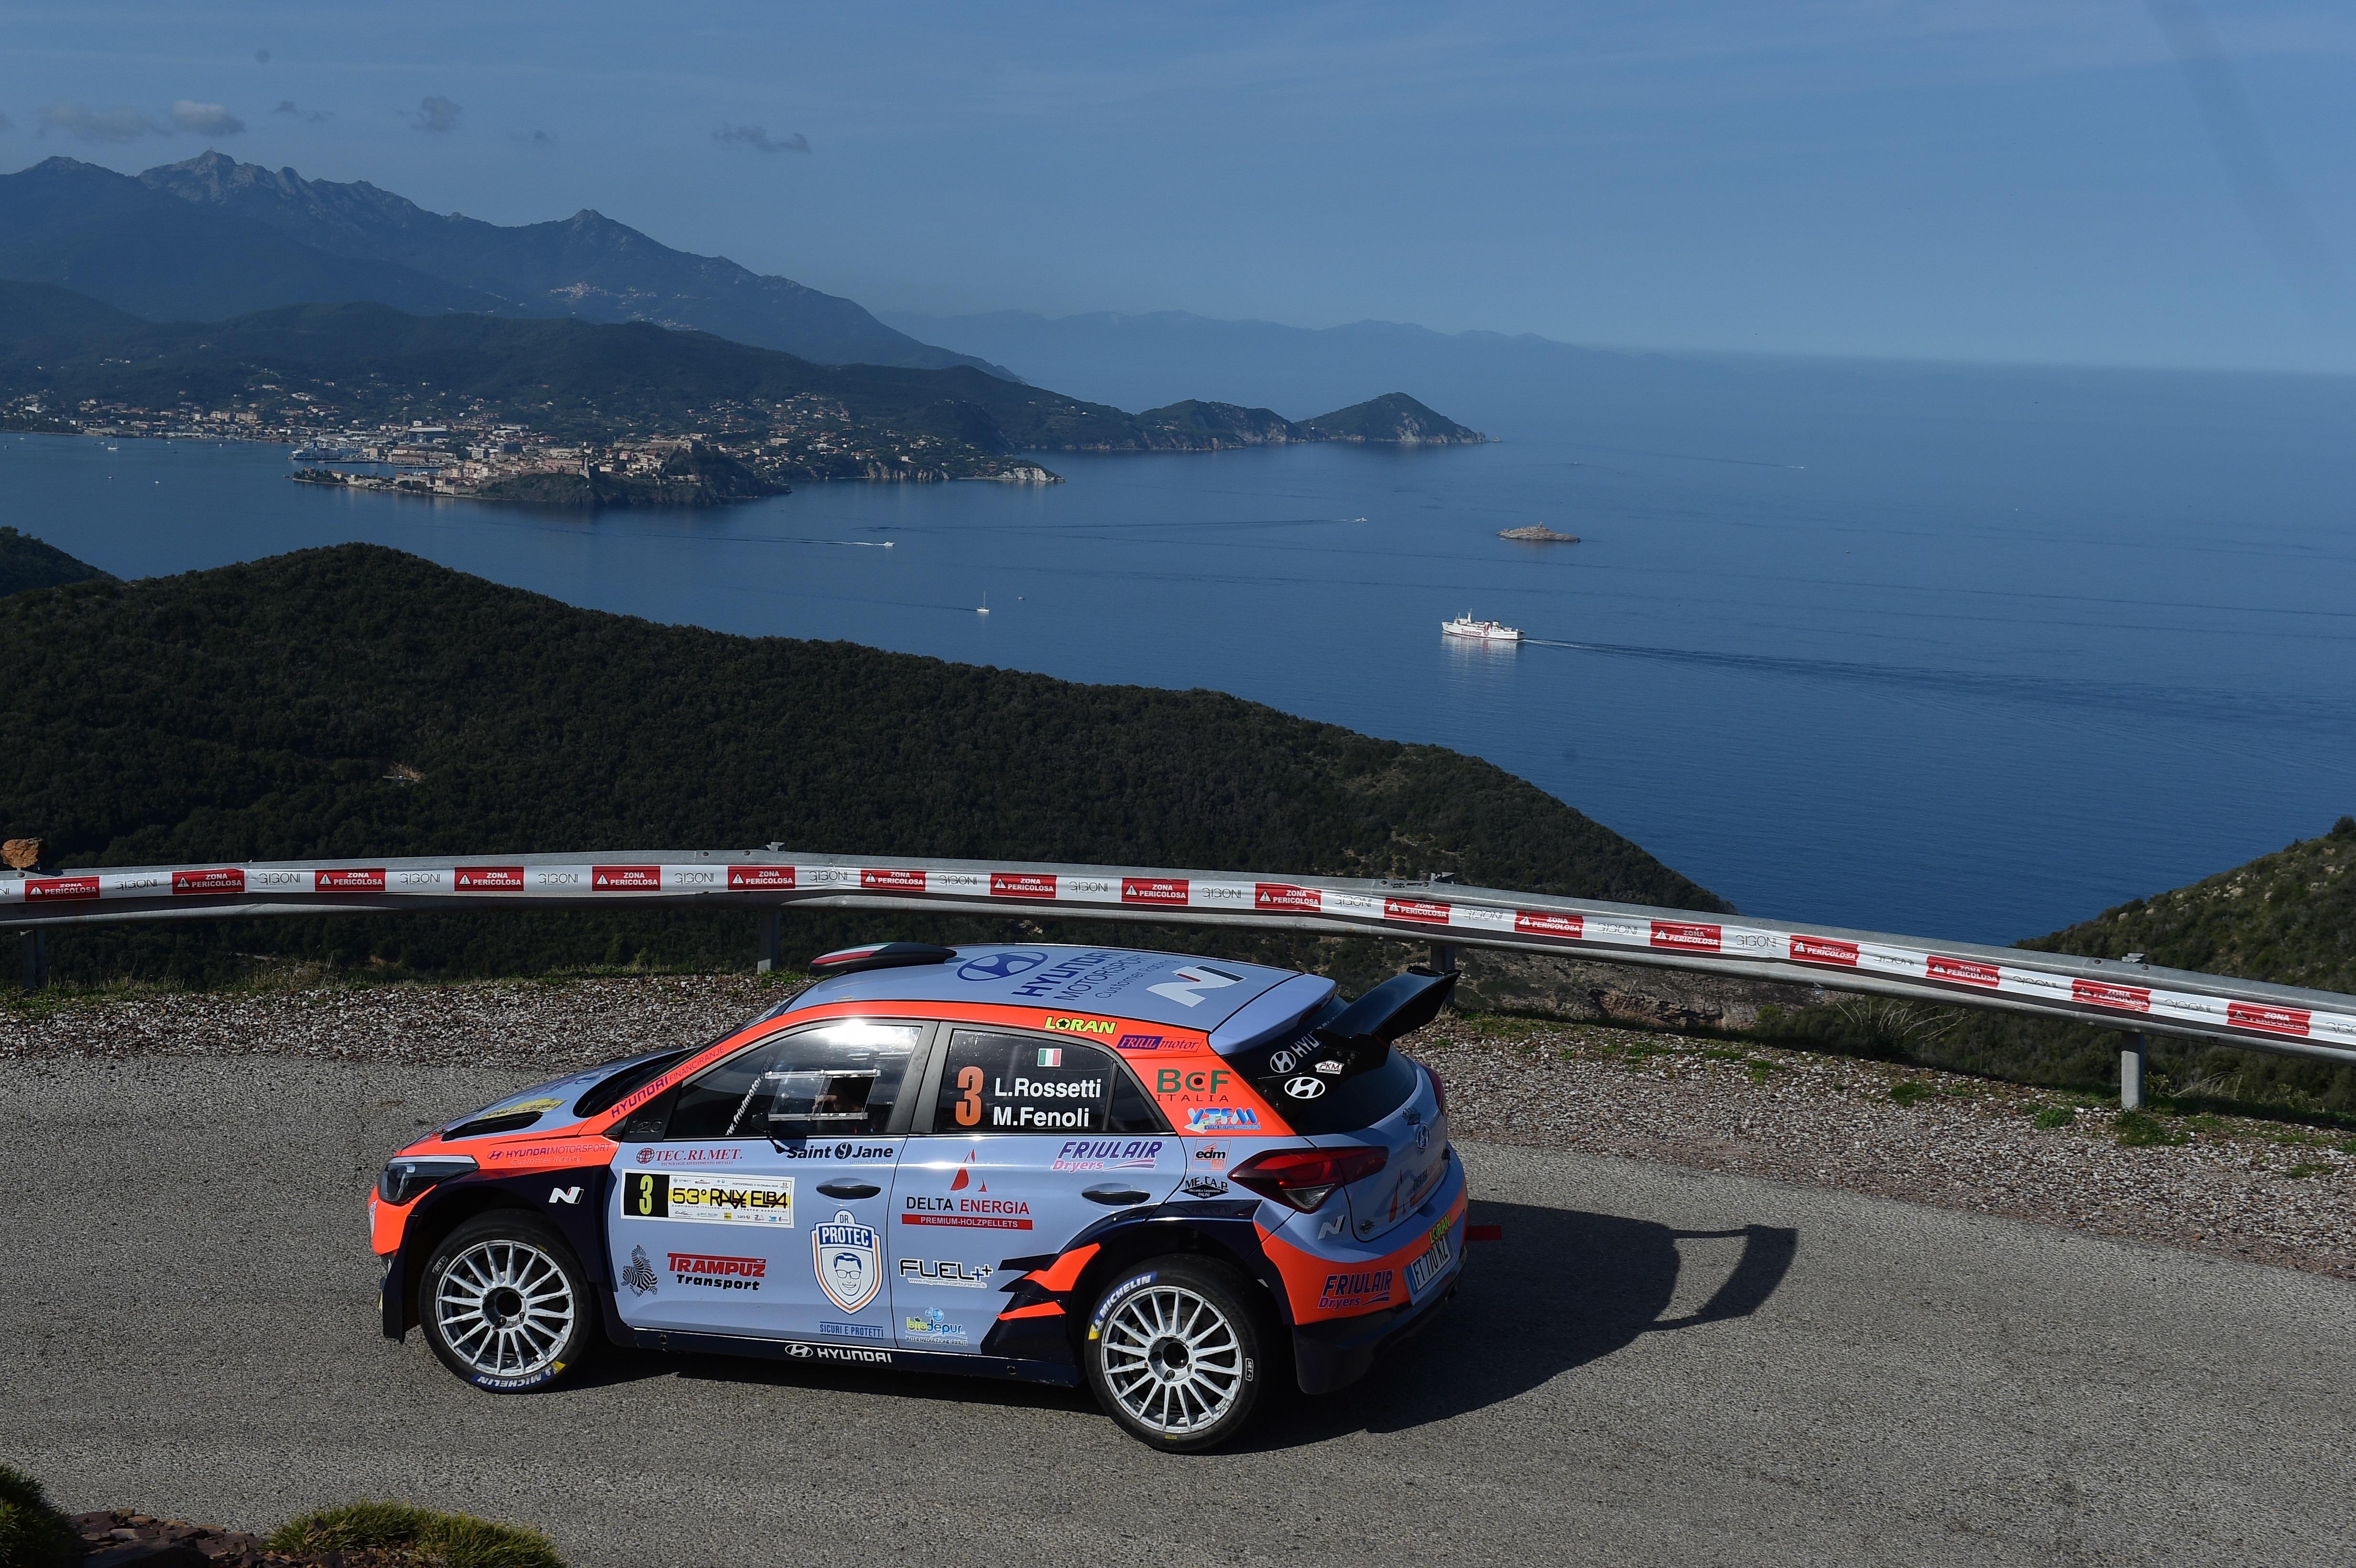 Luca Rossetti - Rallye Elba